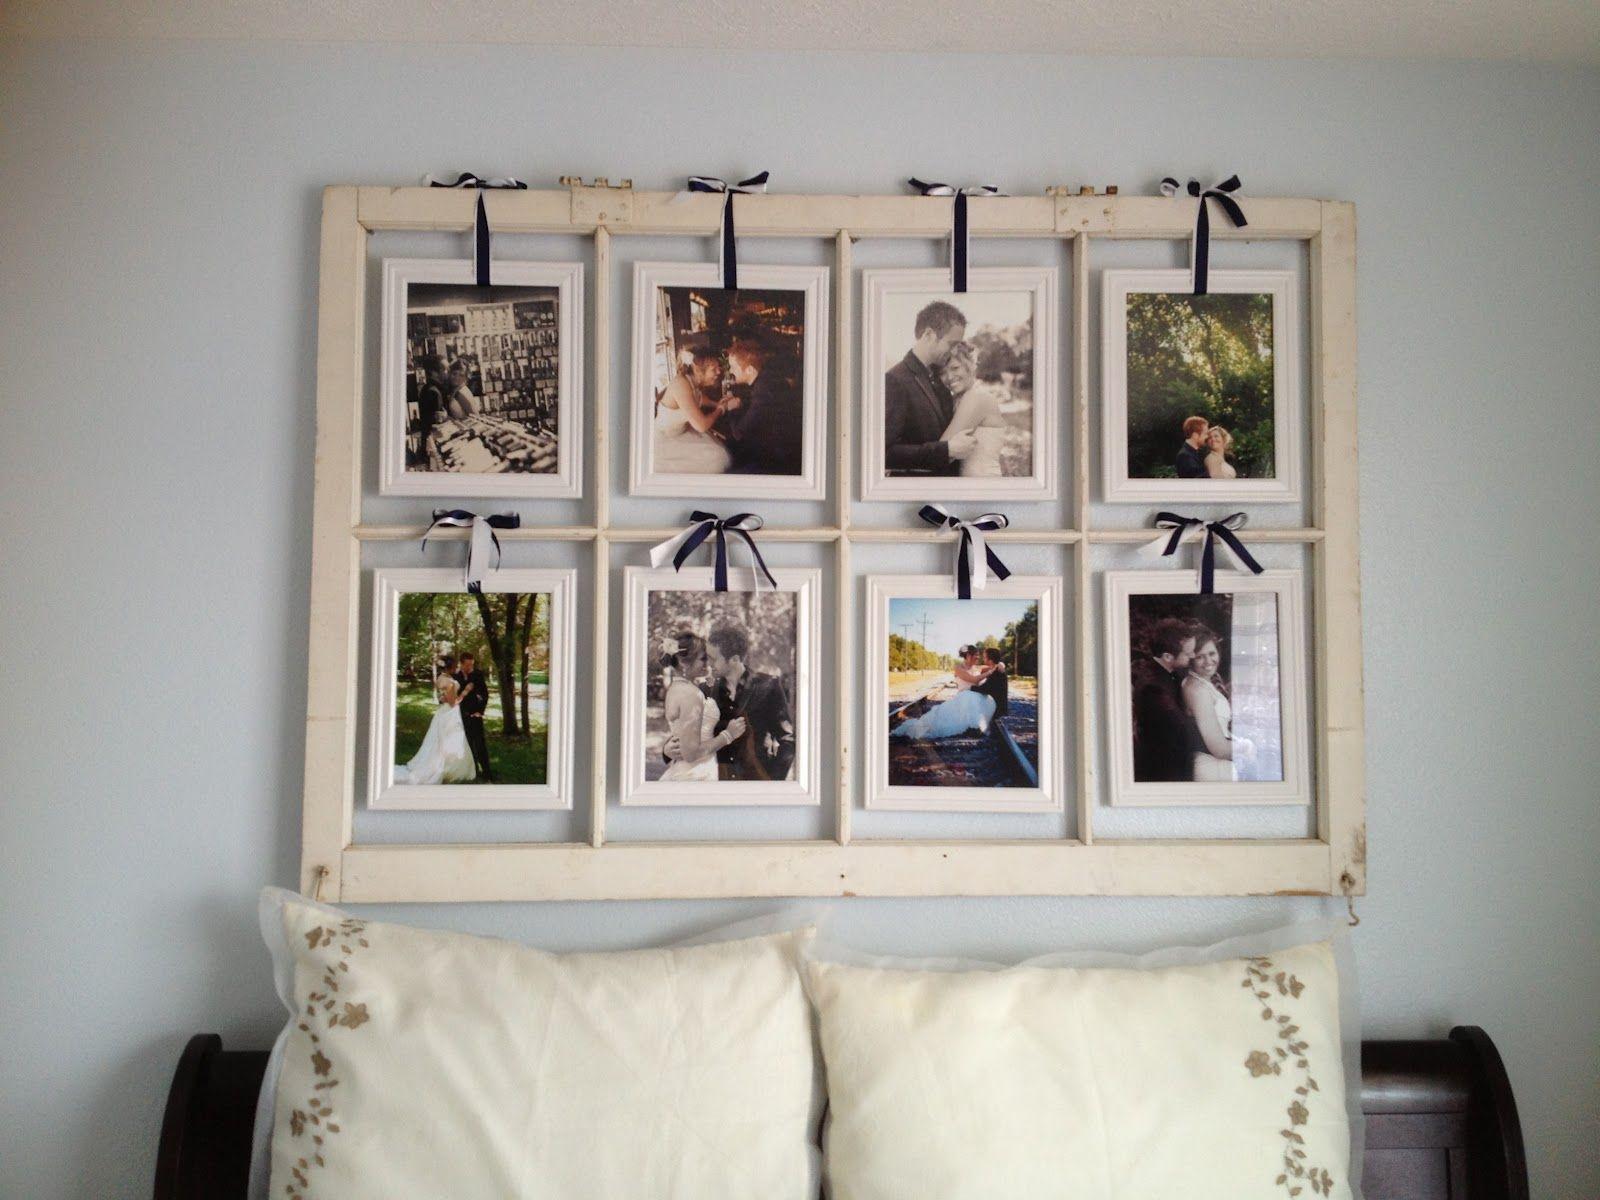 Refurbished Old Window Frames Window Frame Picture Display